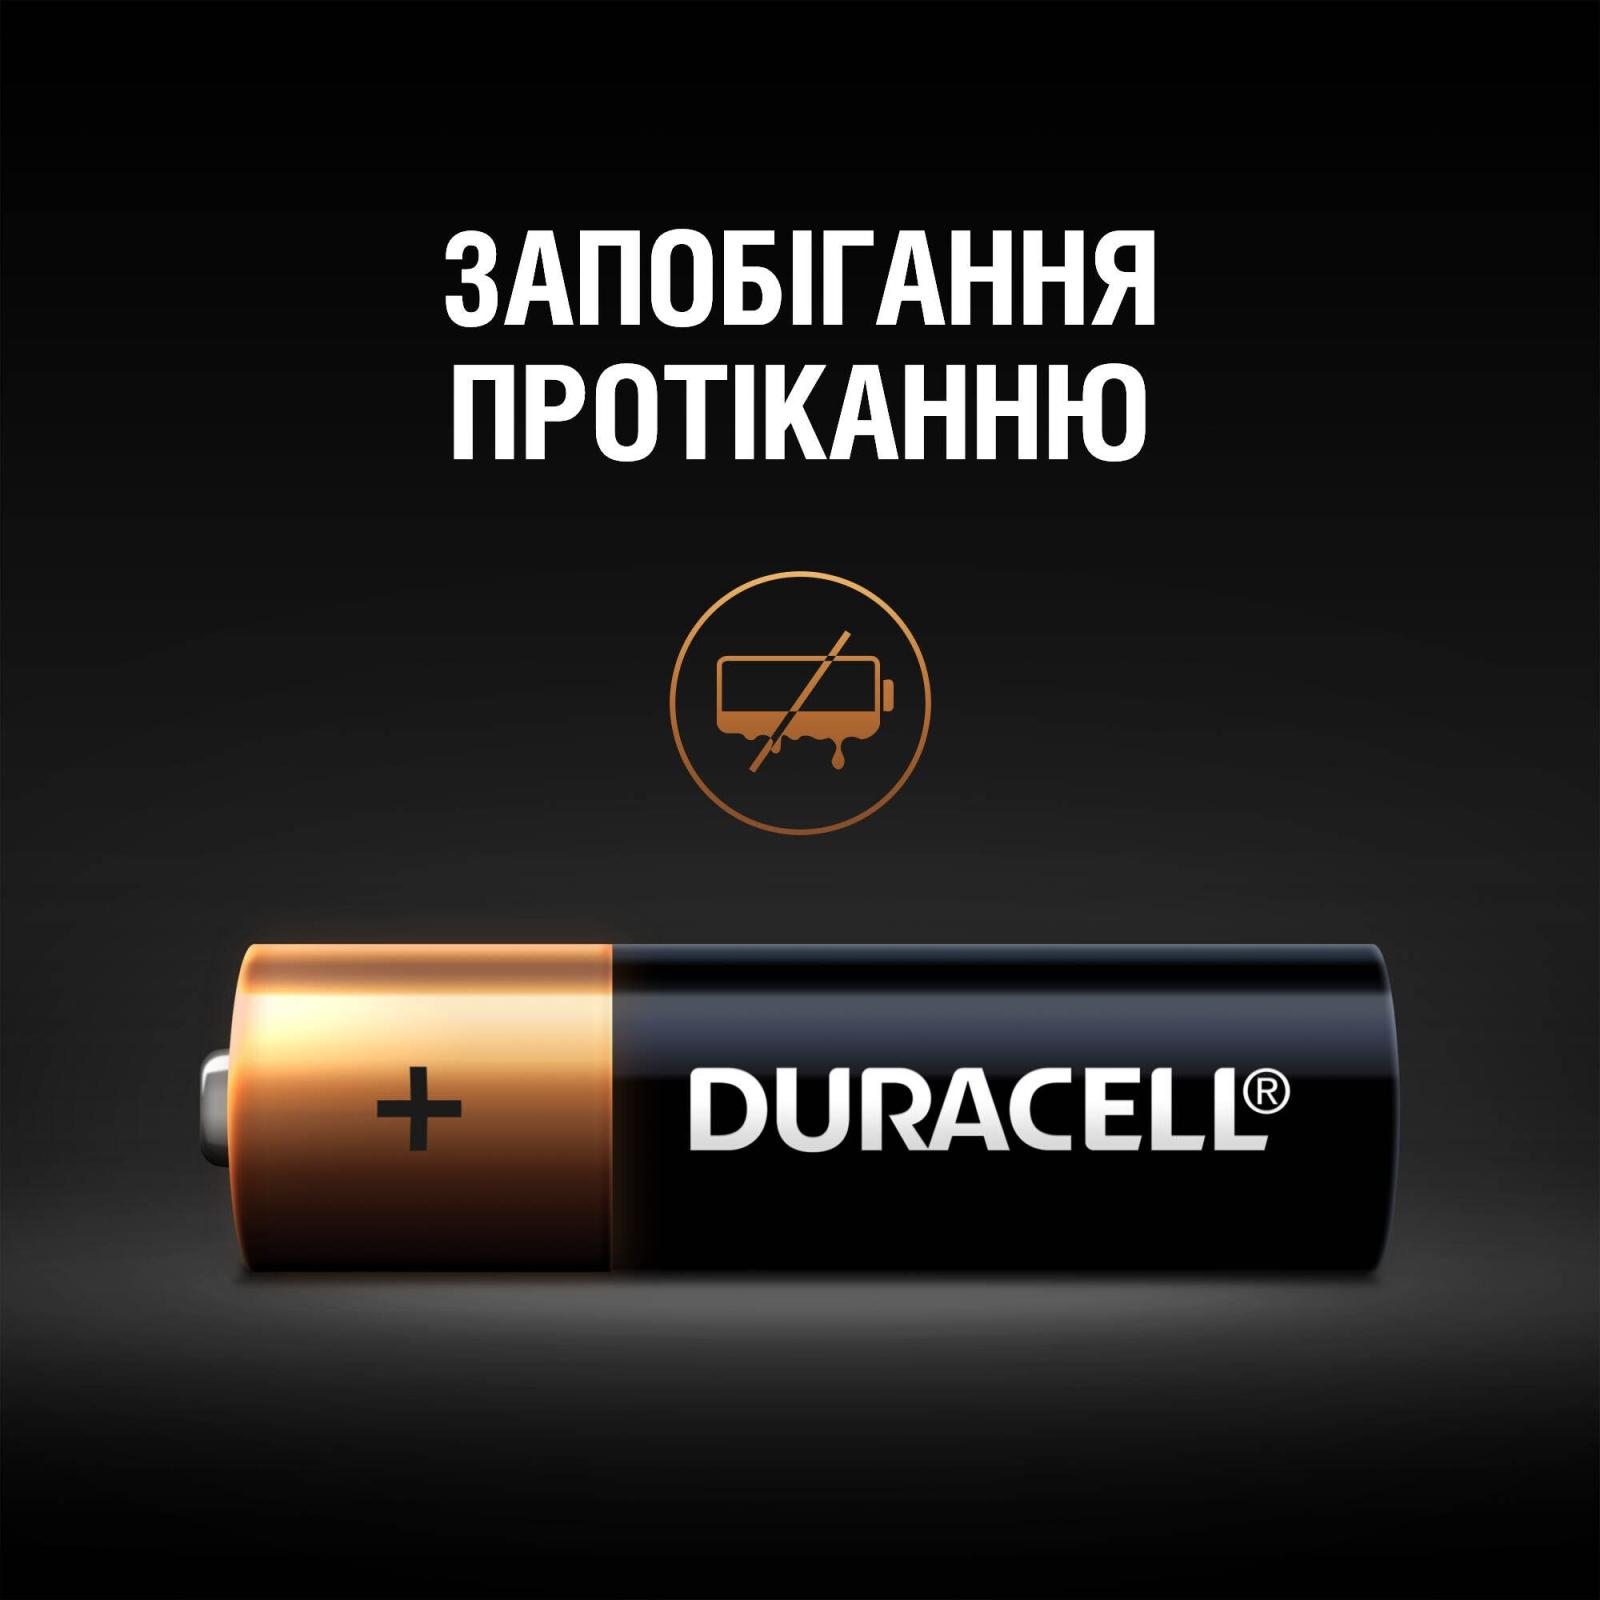 Батарейка Duracell AA MN1500 LR06 * 2 (5000394058163 / 81551267) изображение 6